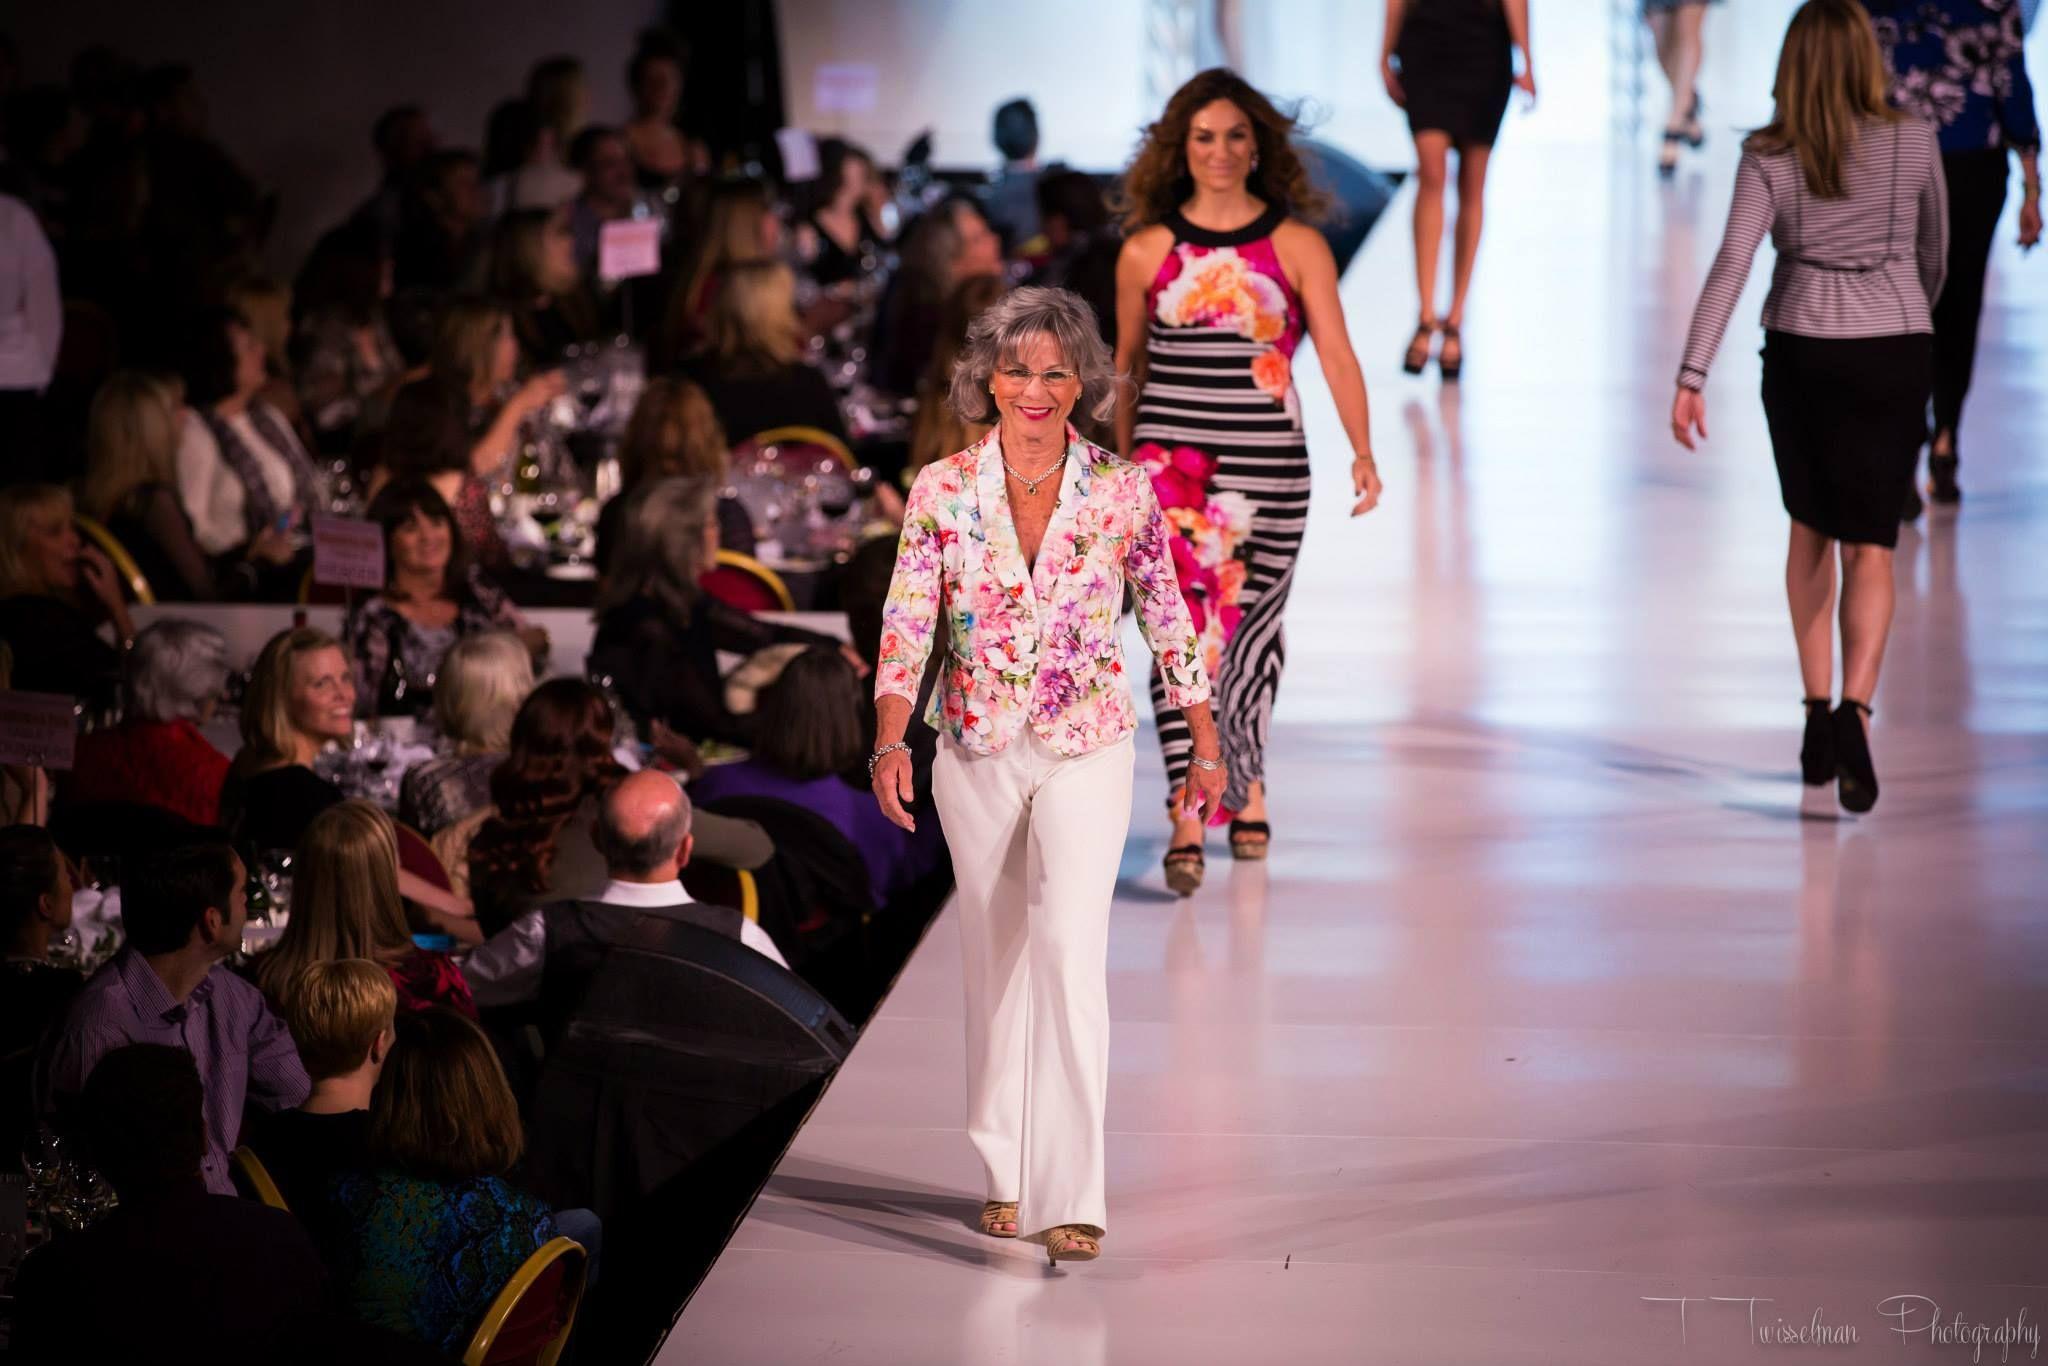 Madonna fashion show san luis obispo - Fashion Show